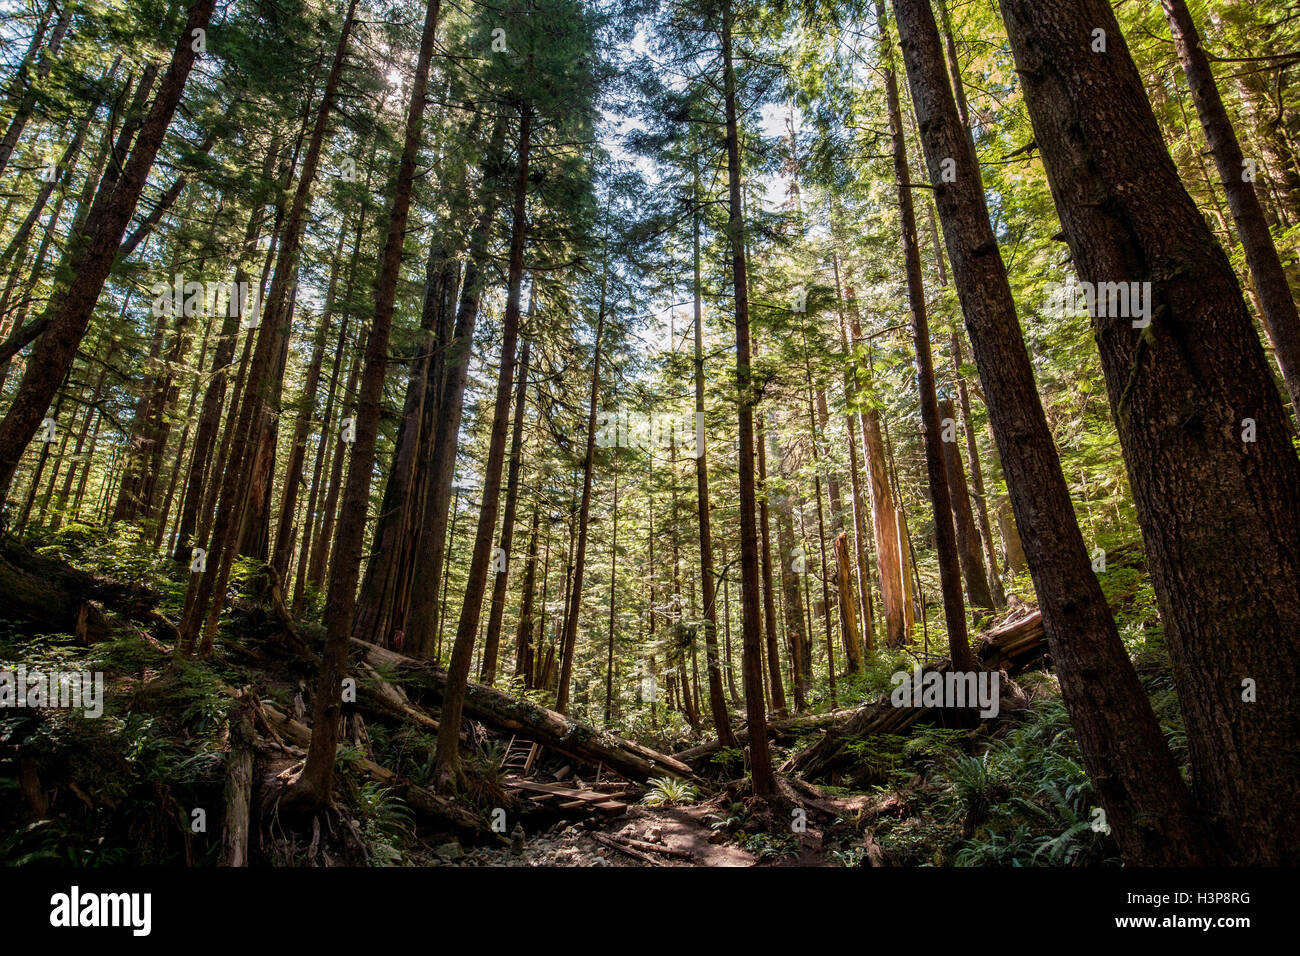 Avatar Grove - Port Renfrew, Isola di Vancouver, British Columbia, Canada Immagini Stock